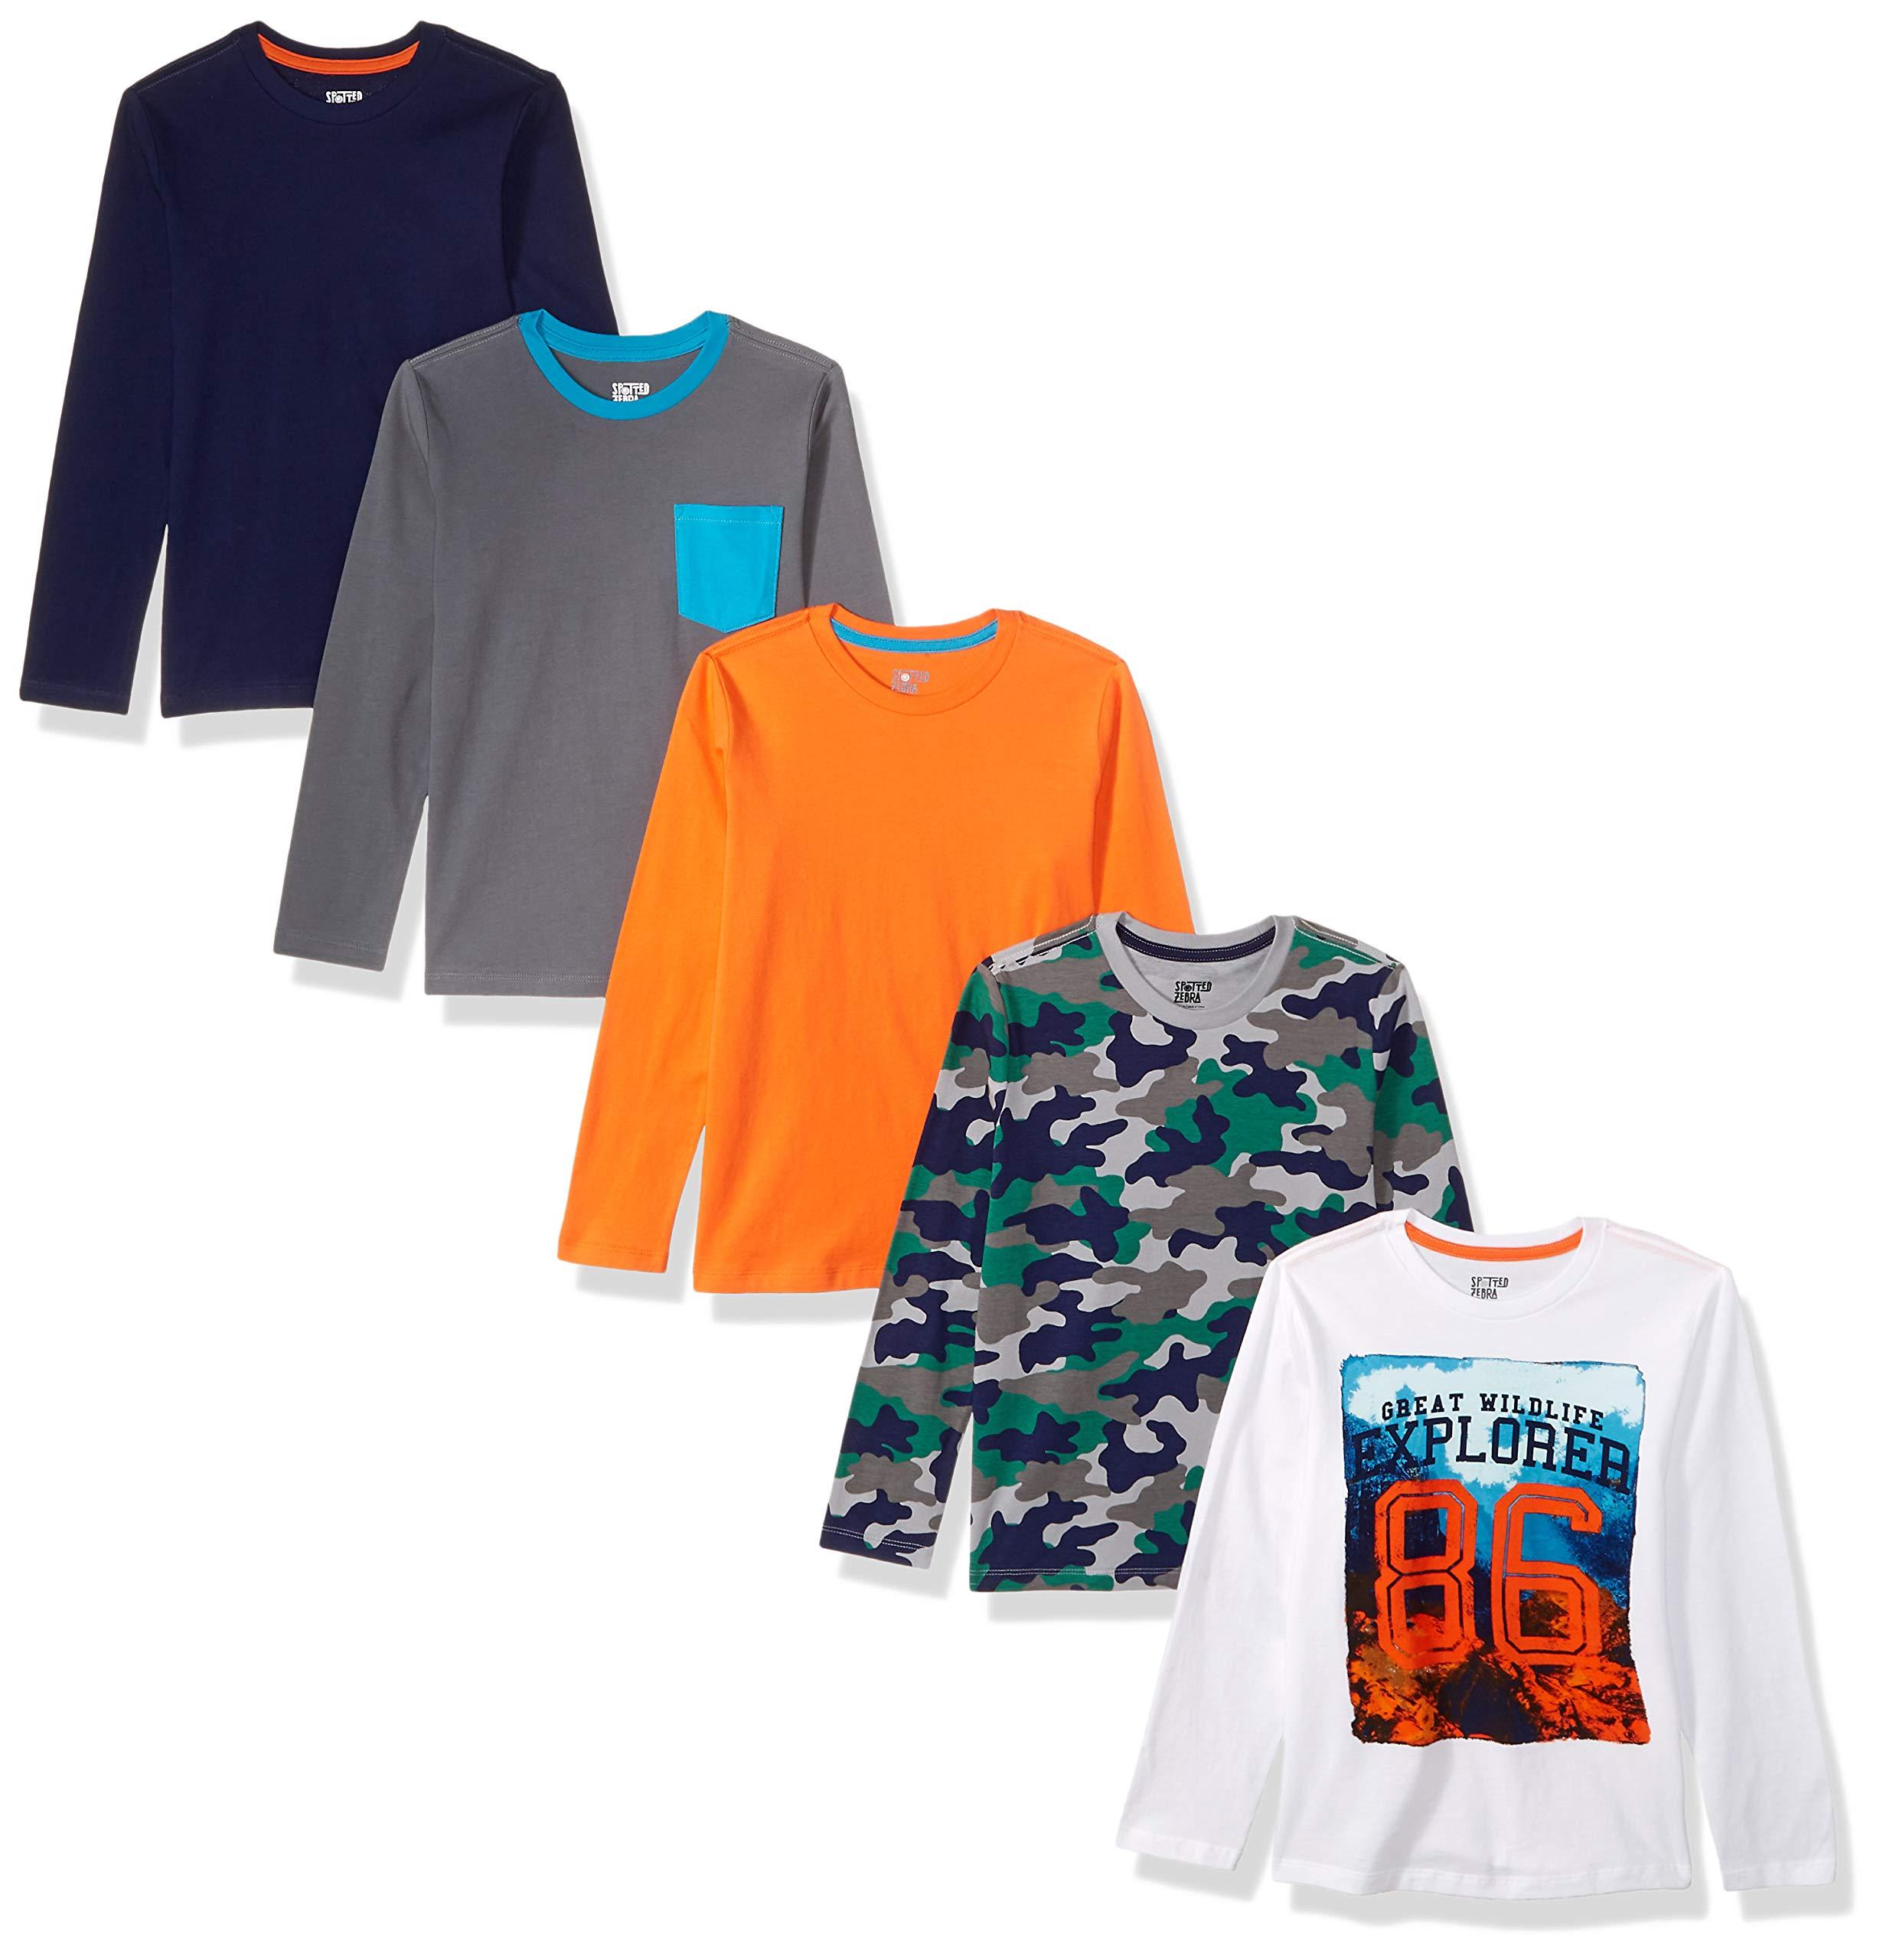 Spotted Zebra Little Boys' 5-Pack Long-Sleeve T-Shirts, Explorer, Small (6-7)